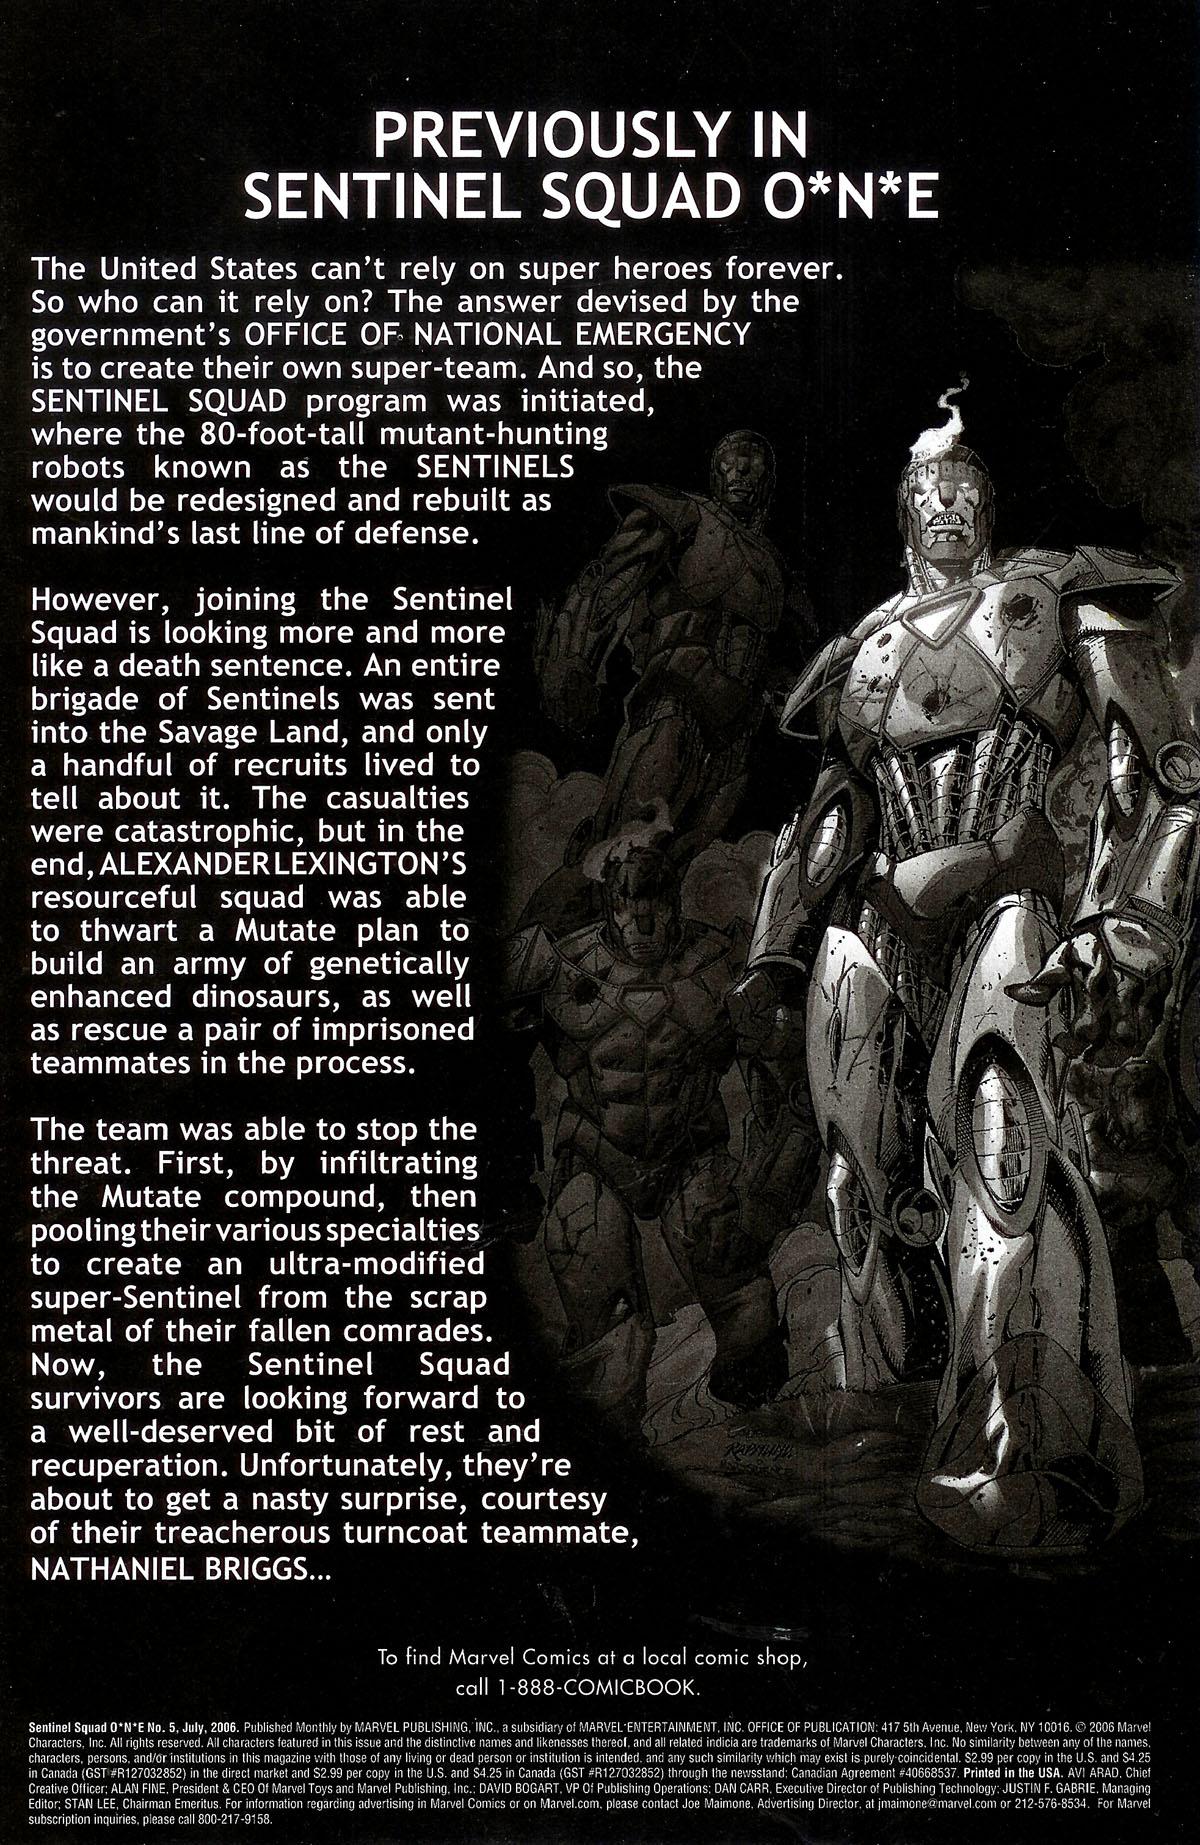 Read online Sentinel Squad O*N*E comic -  Issue #5 - 2